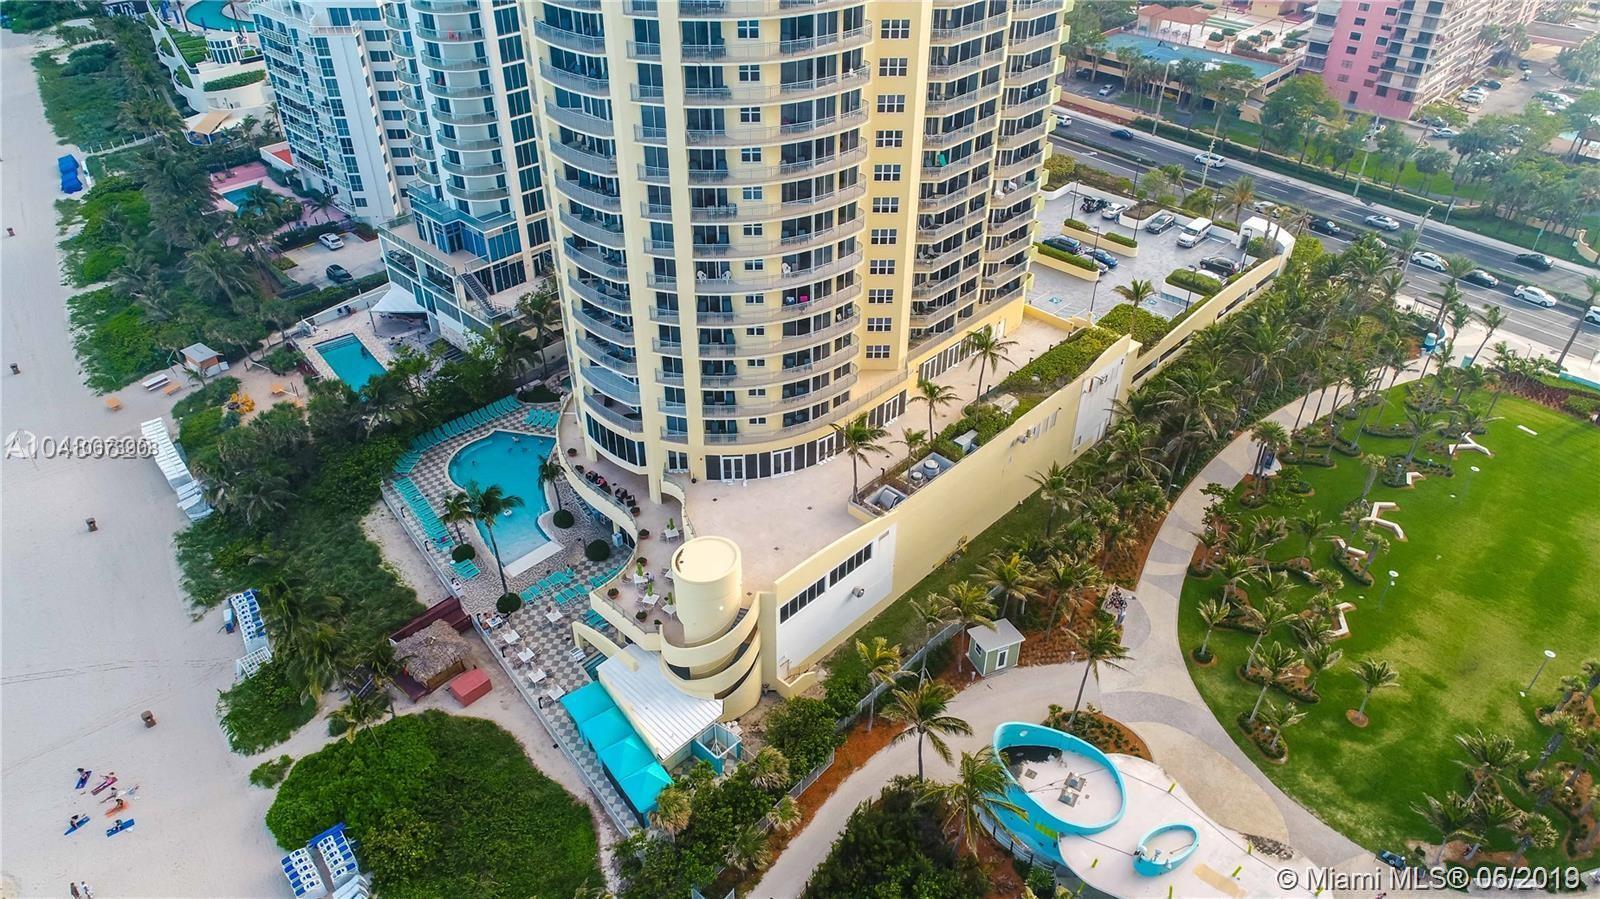 17375 Collins Av, Sunny Isles Beach, Florida